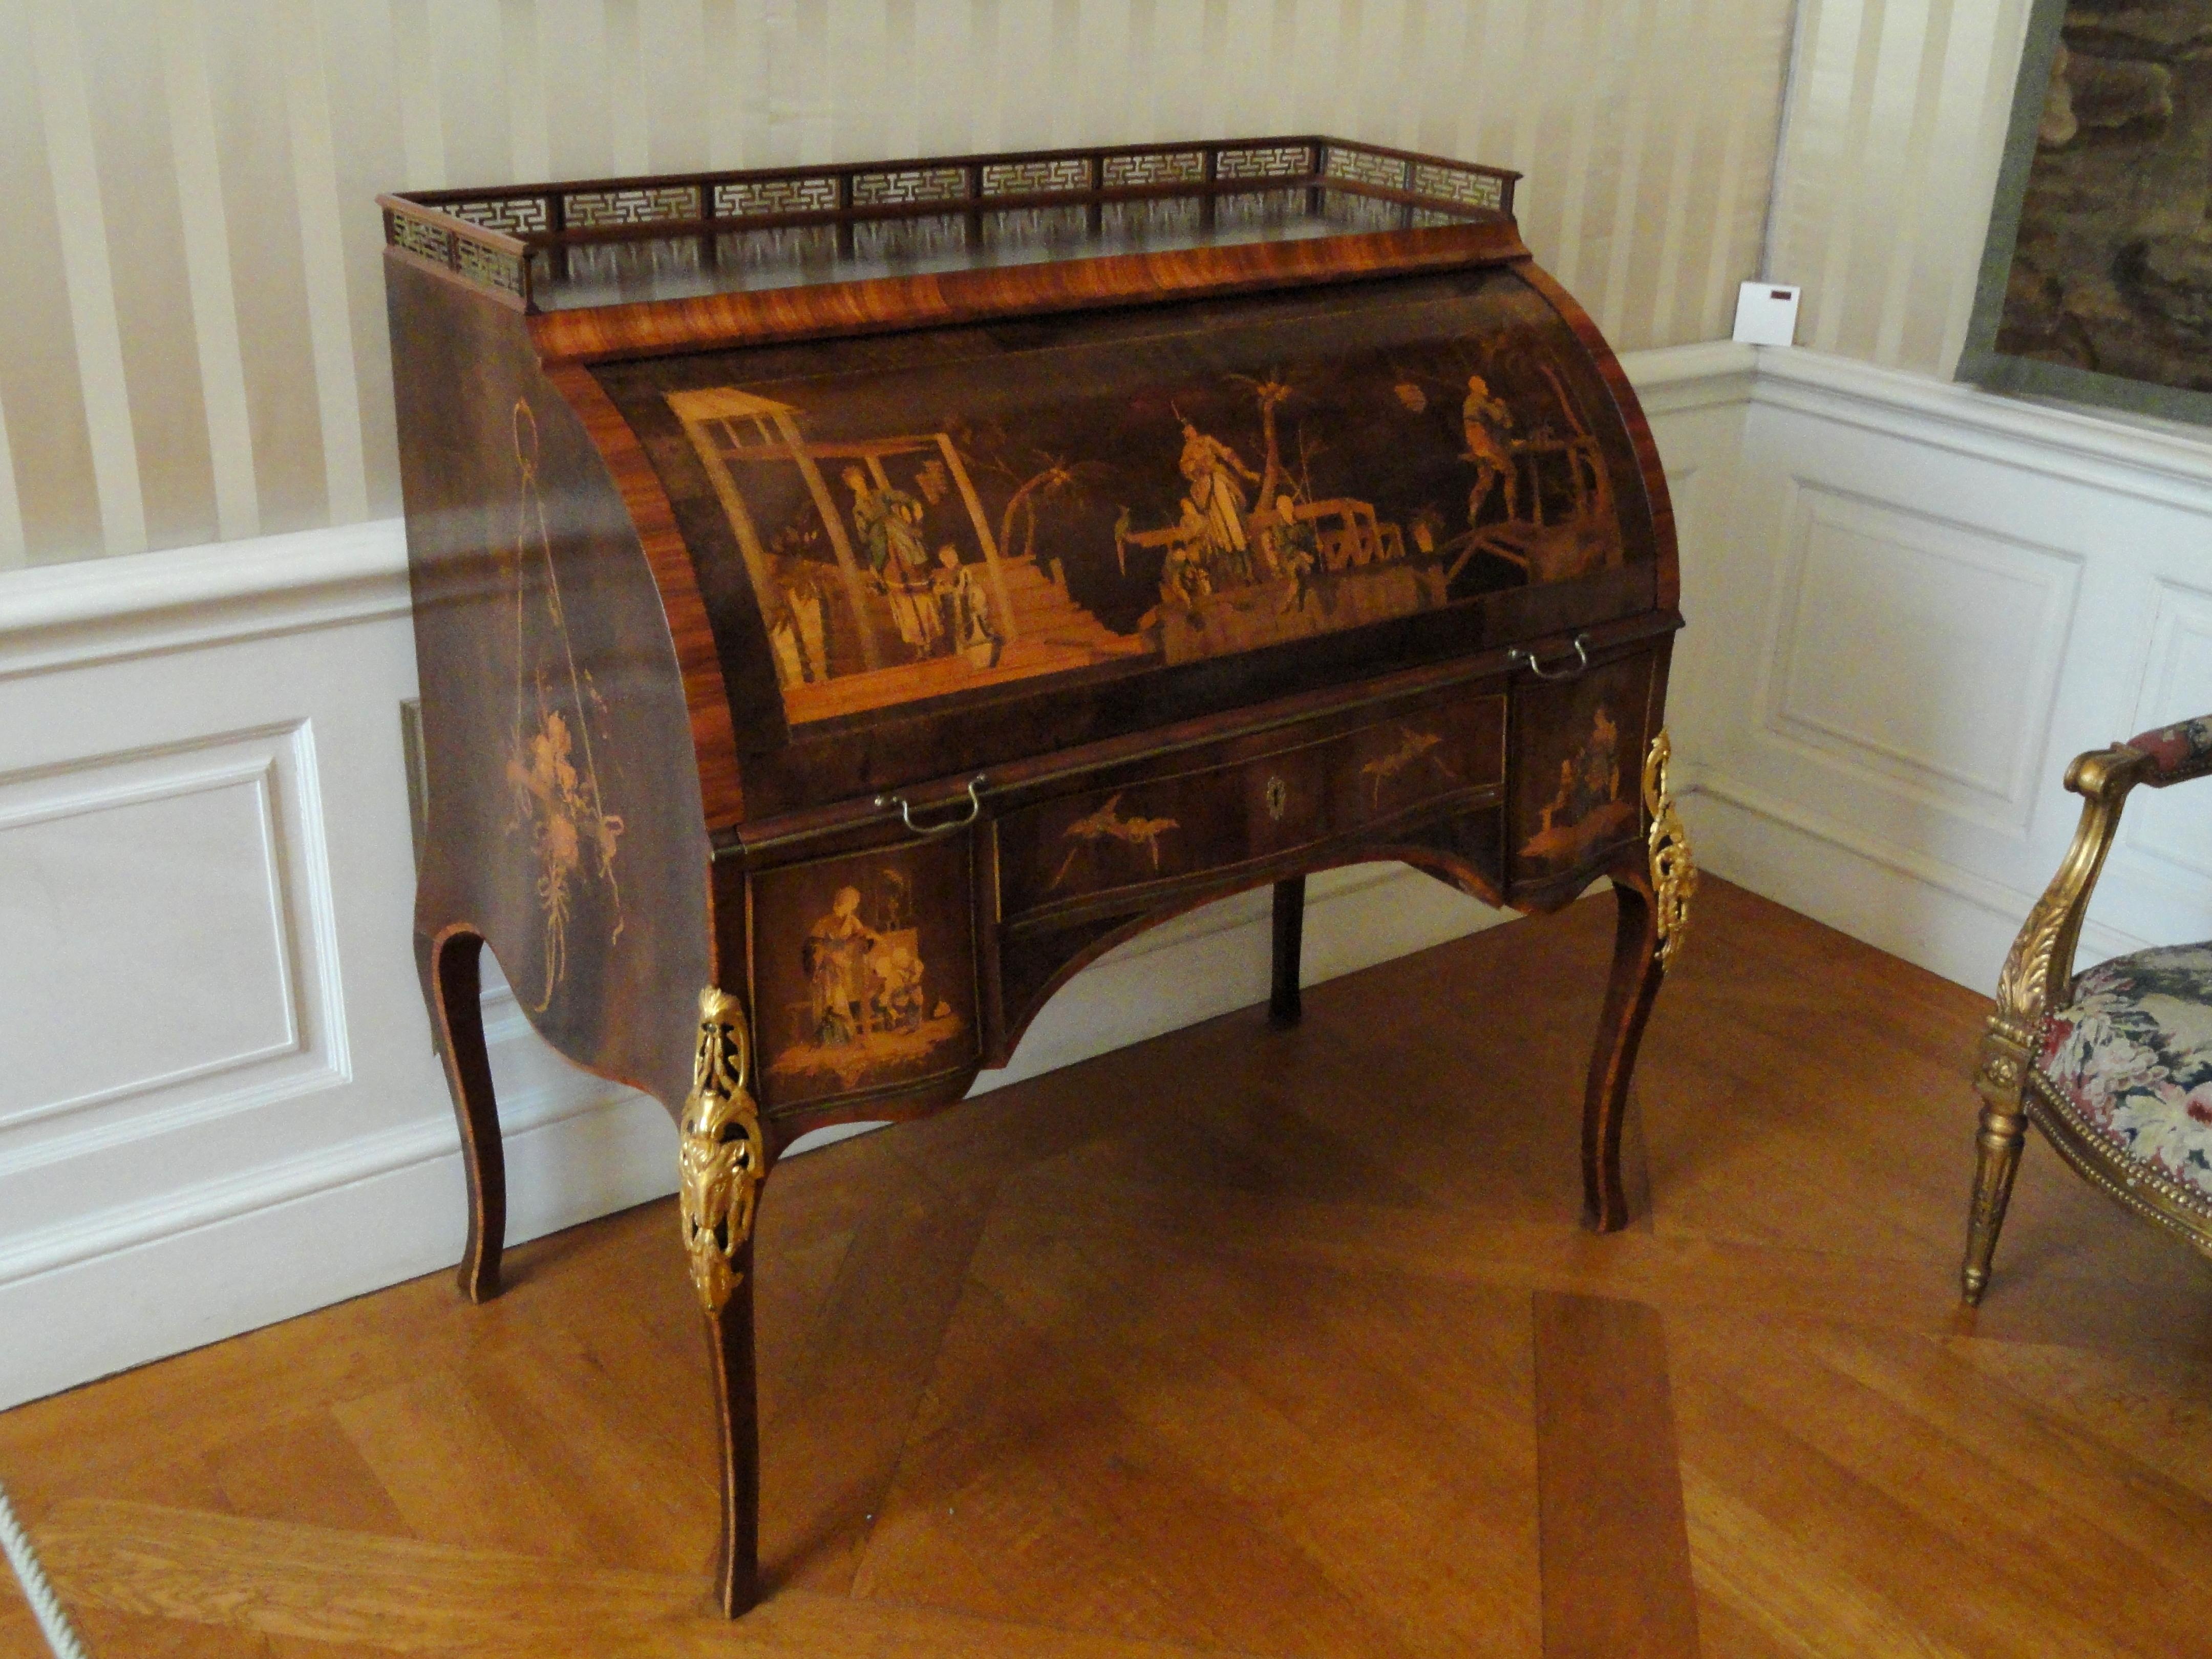 Filecylinder Desk David Roentgen Münchner Residenz Dsc07475